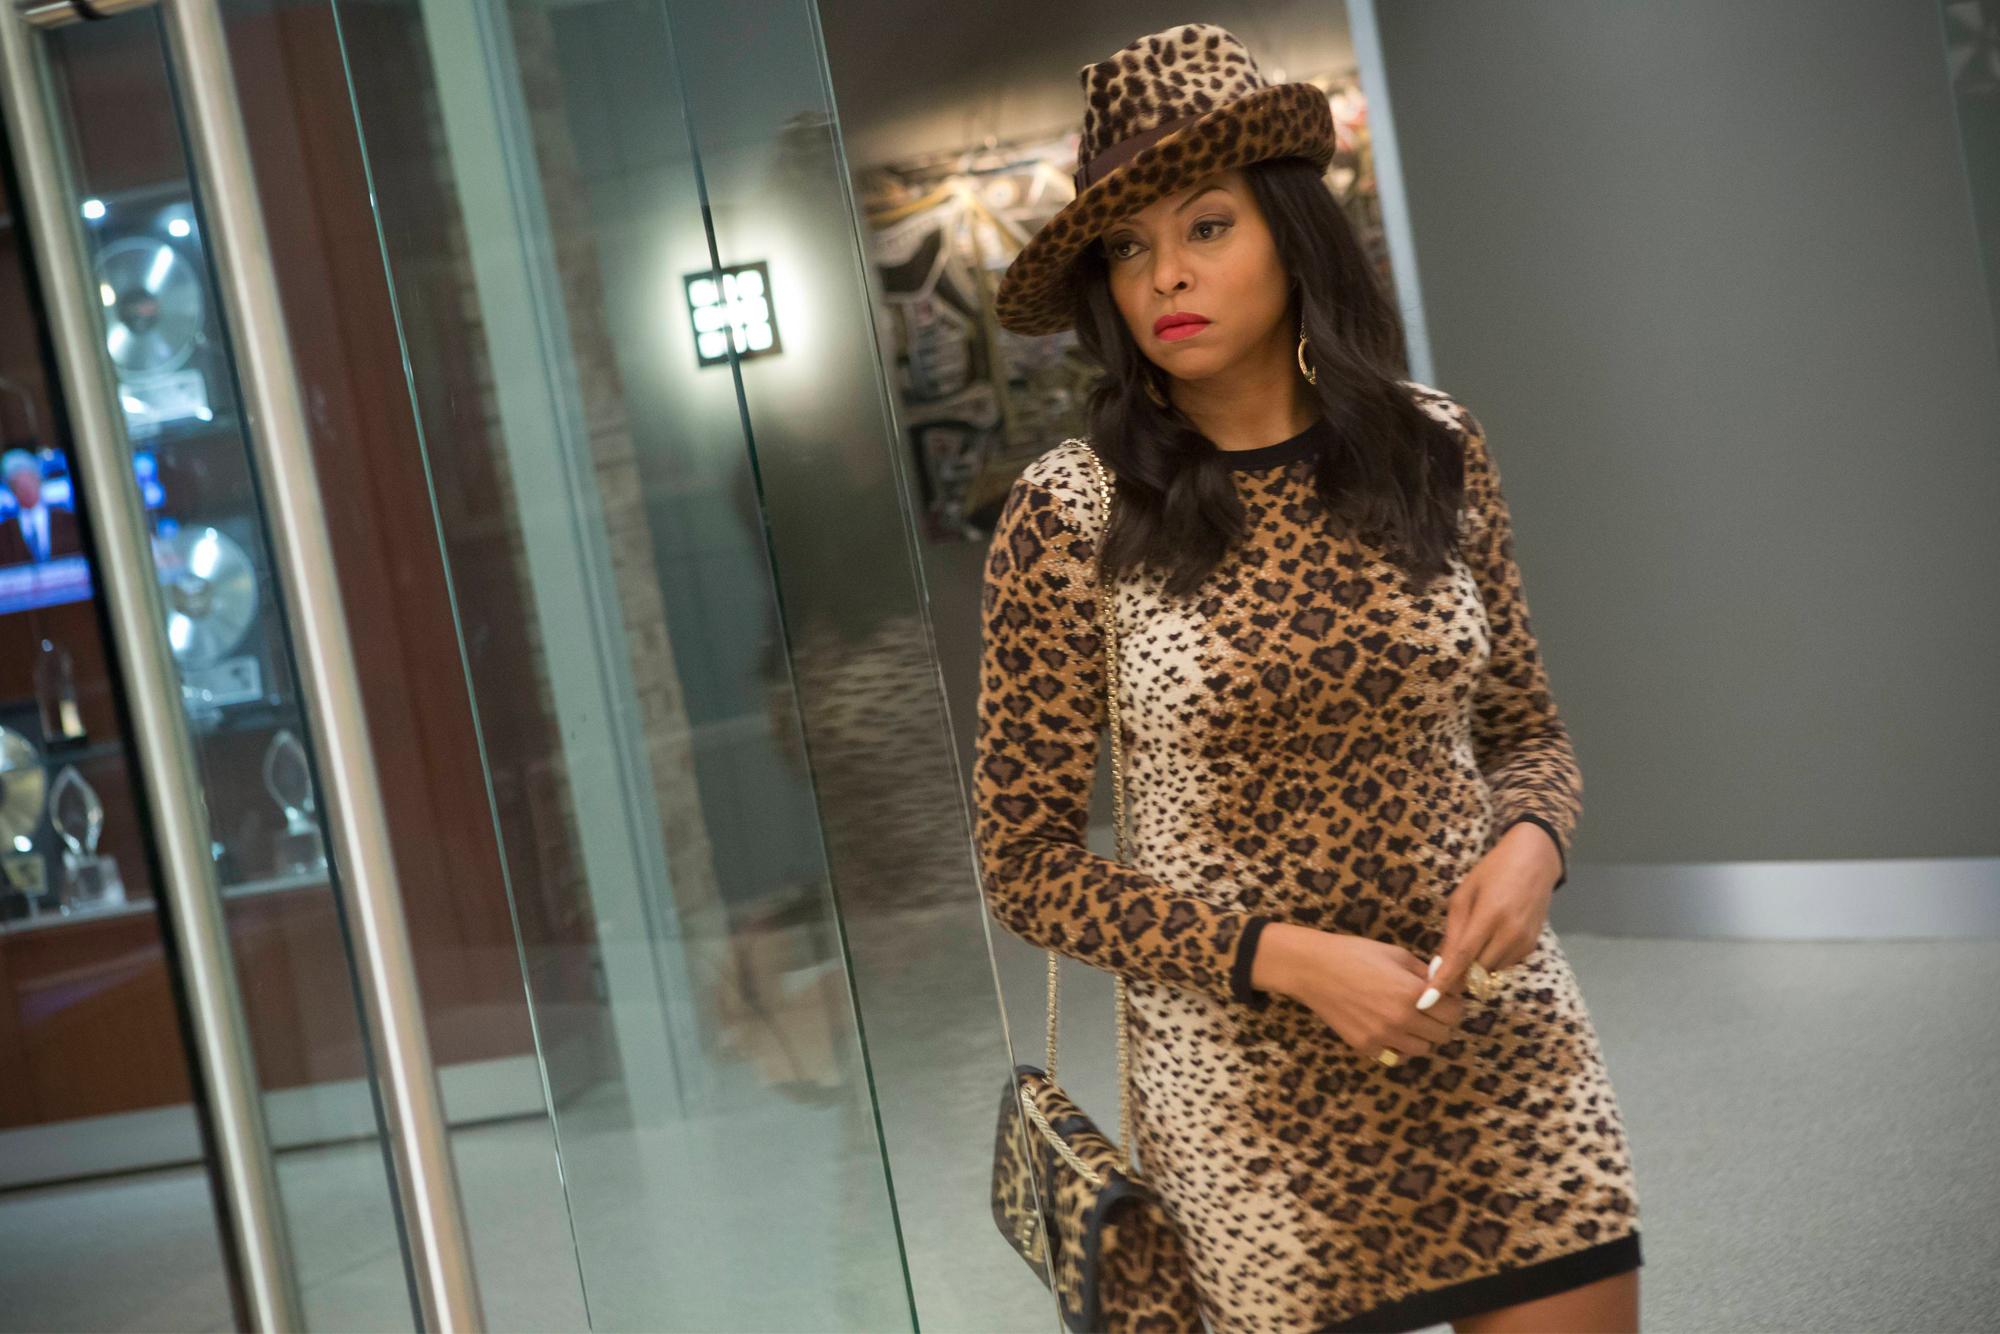 Fresh out of jail, she sports a knee-length leopard print dress. (Chuck Hodes/Fox)